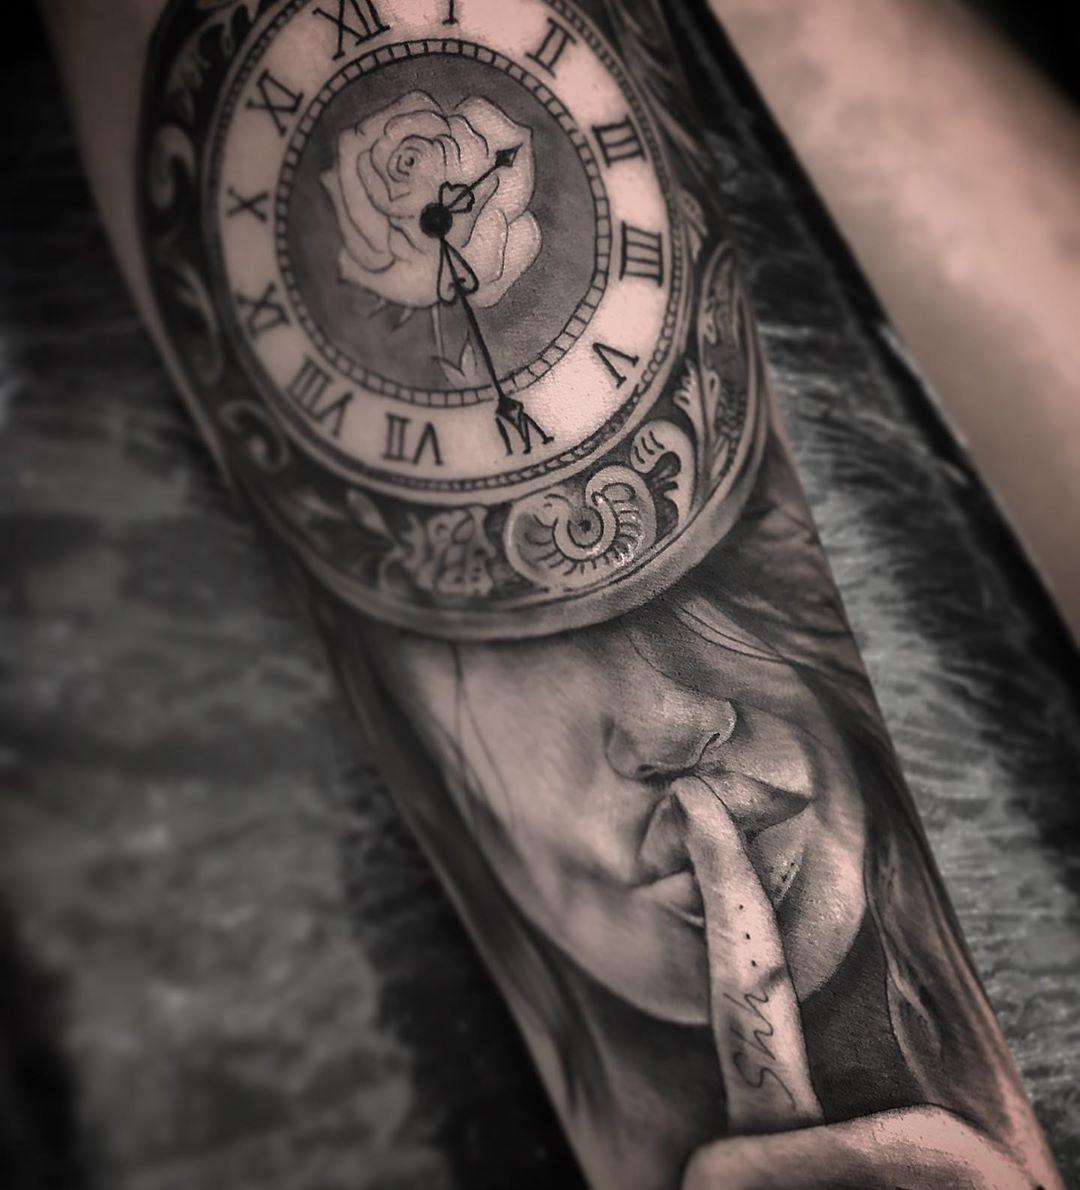 26-tainstvennaja-tatuirovka-s-devushkoj-i-chasami.jpg